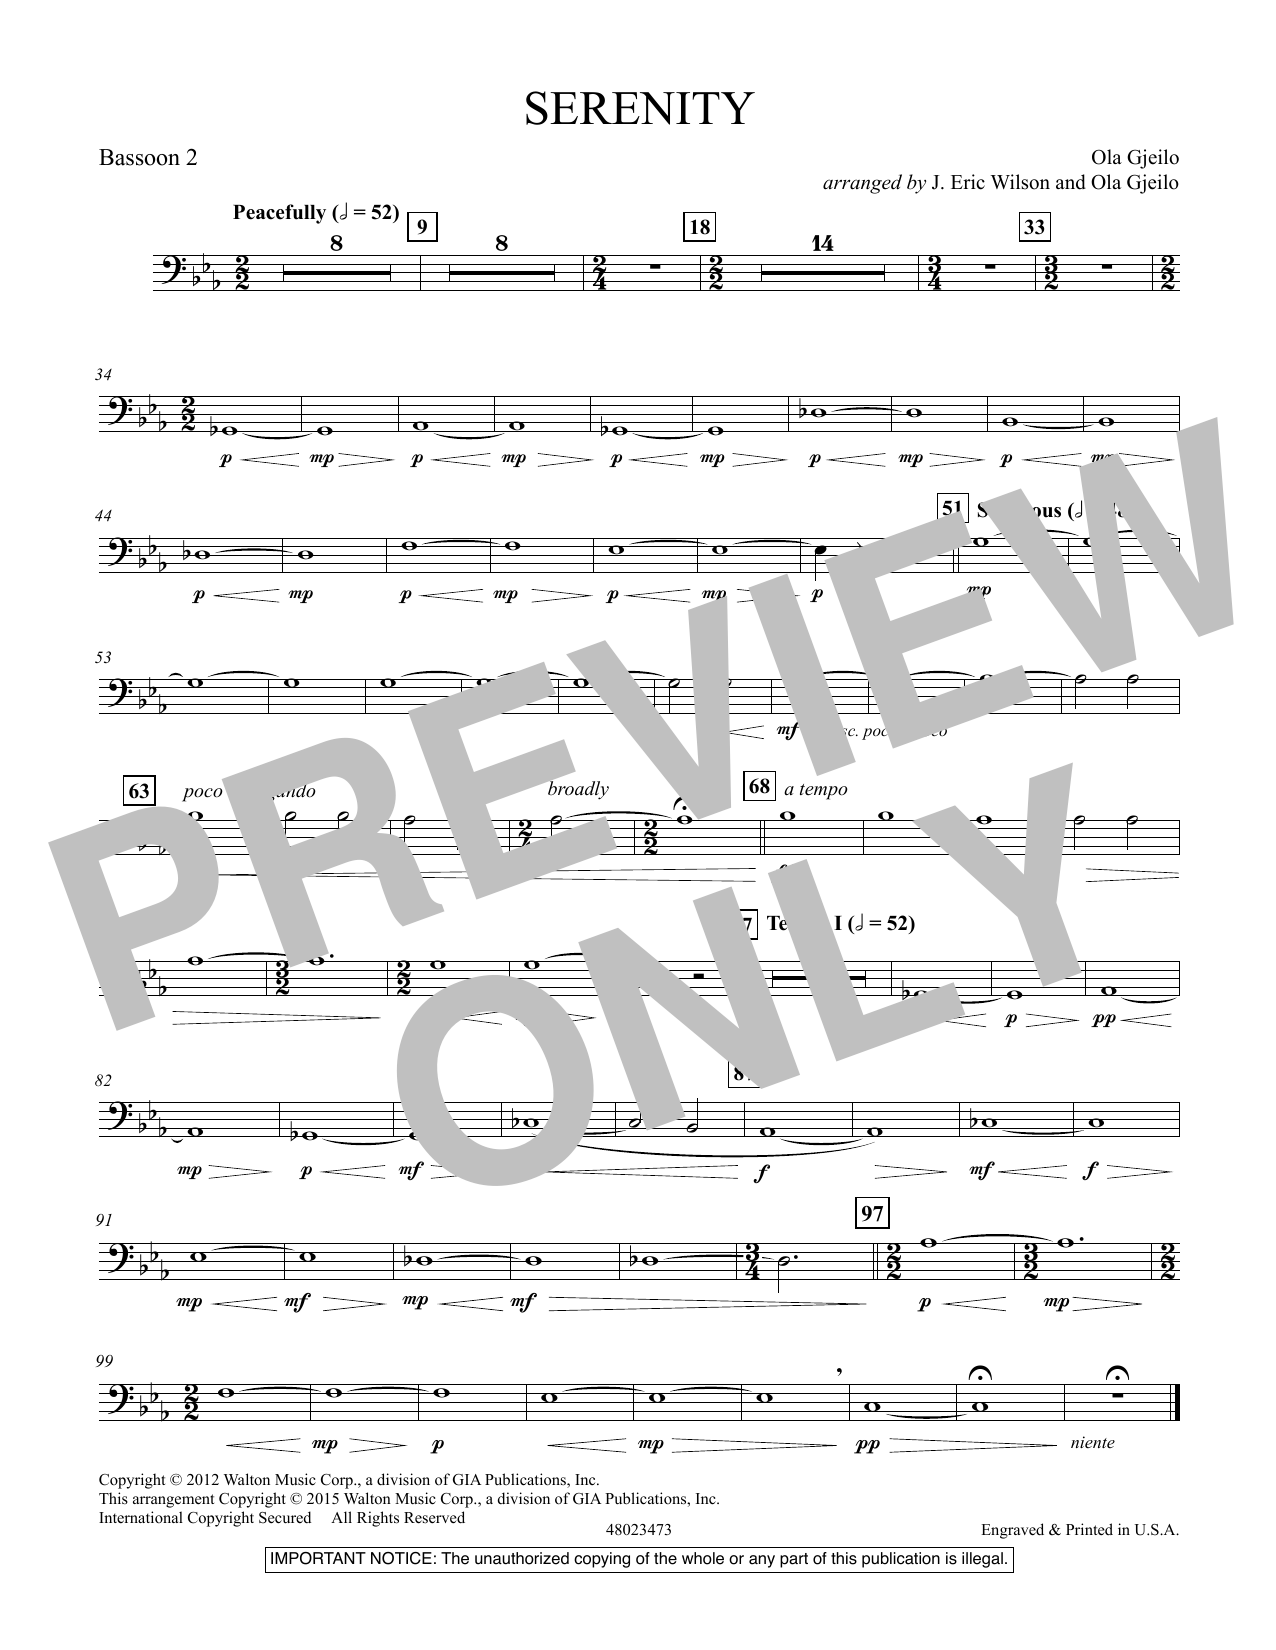 Serenity - Bassoon 2 (Concert Band)